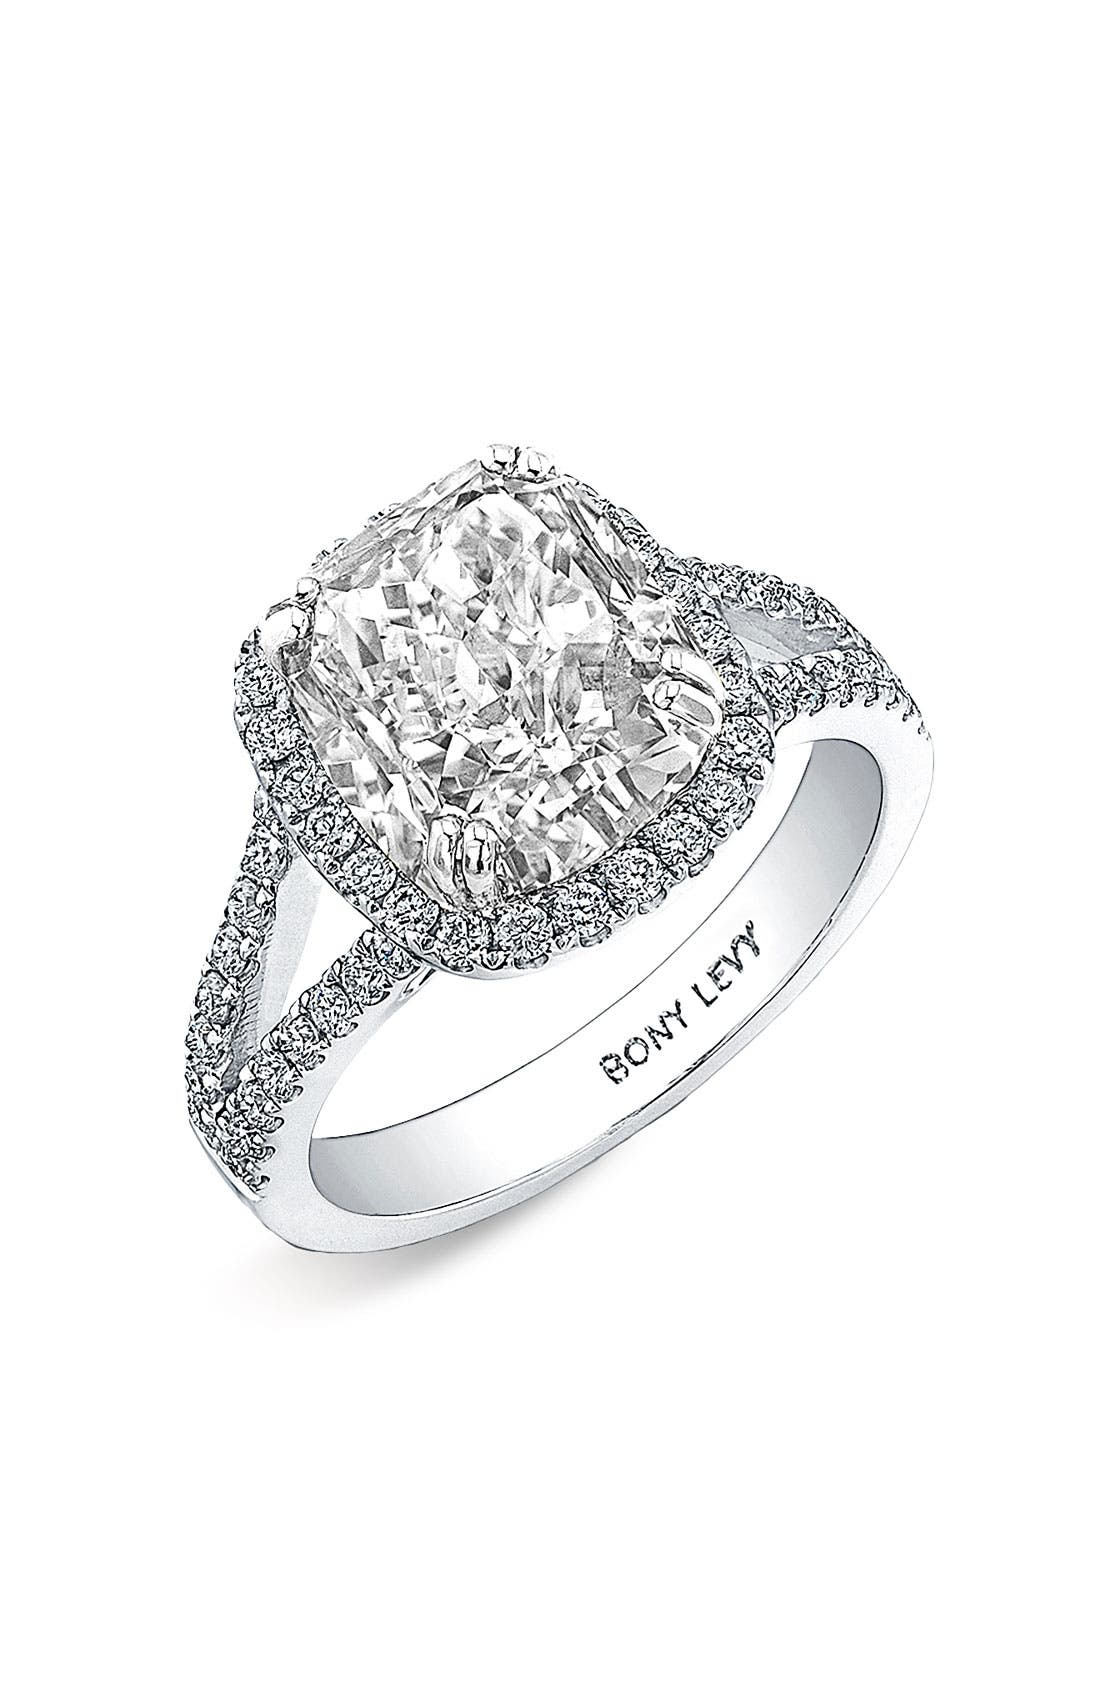 Alternate Image 1 Selected - Bony Levy Diamond Split Shank Engagement Ring Setting (Nordstrom Exclusive)